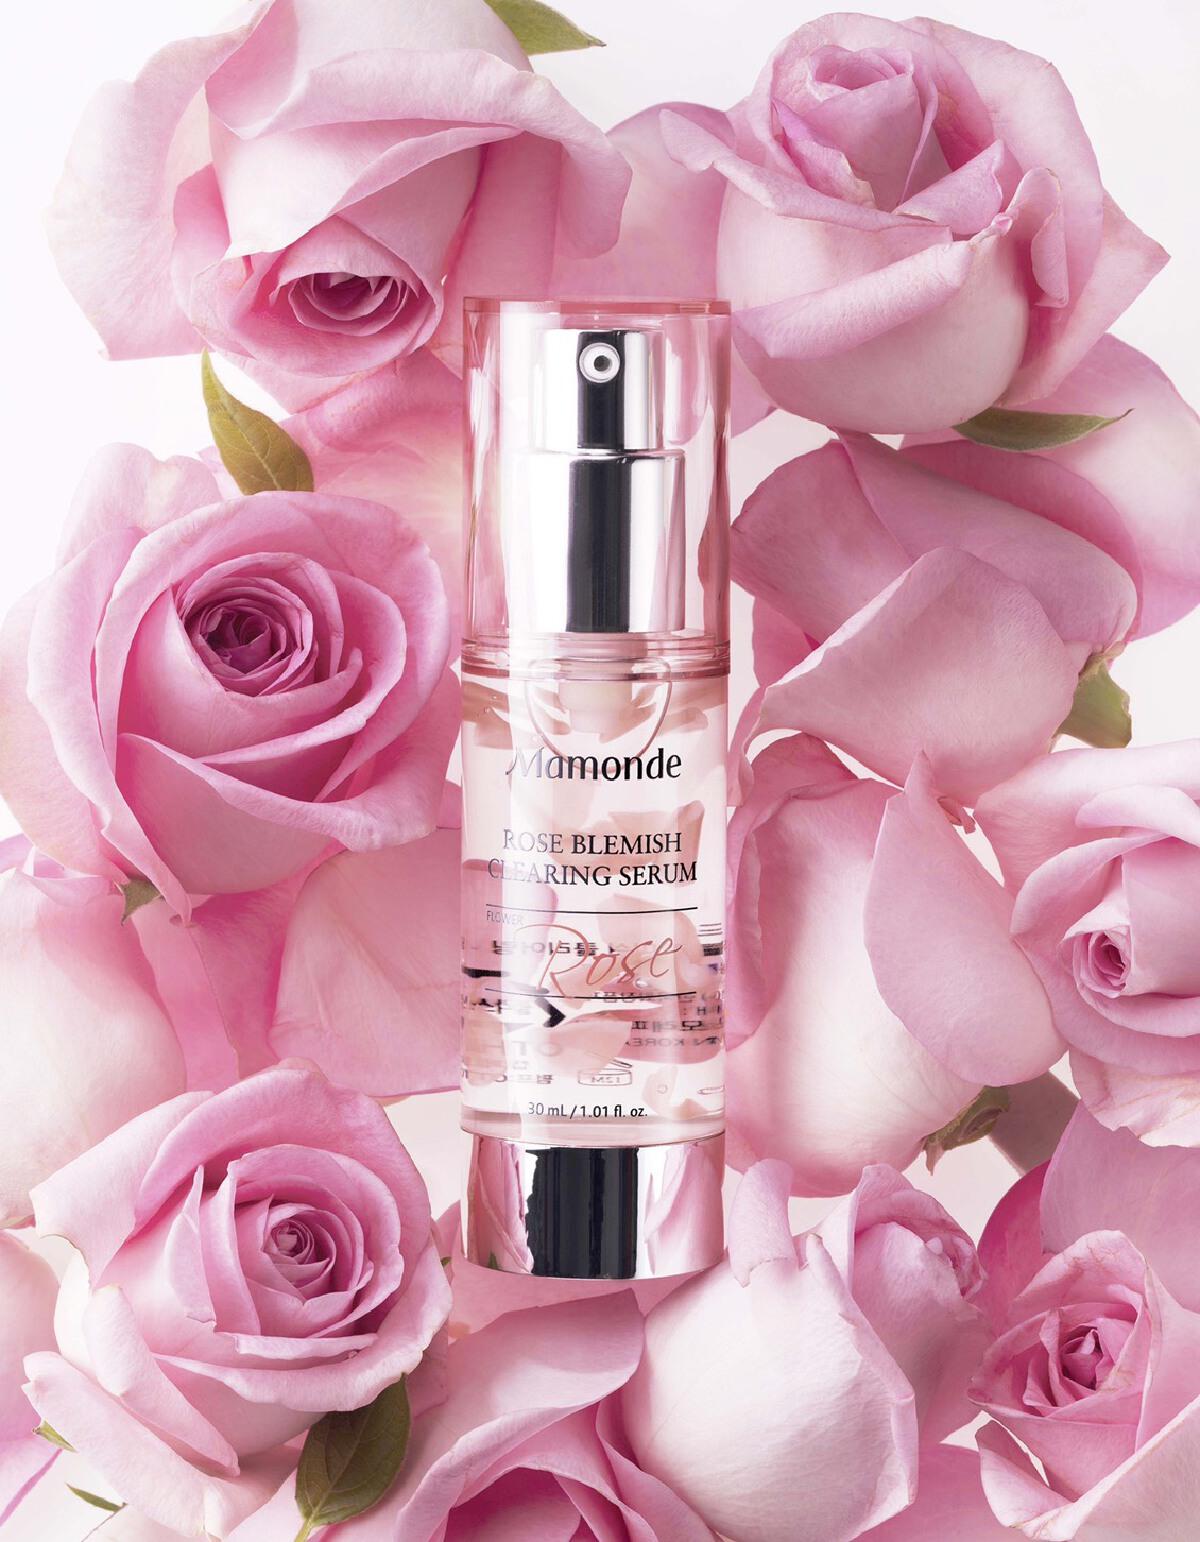 Mamonde Rose Blemish Clearing Serum